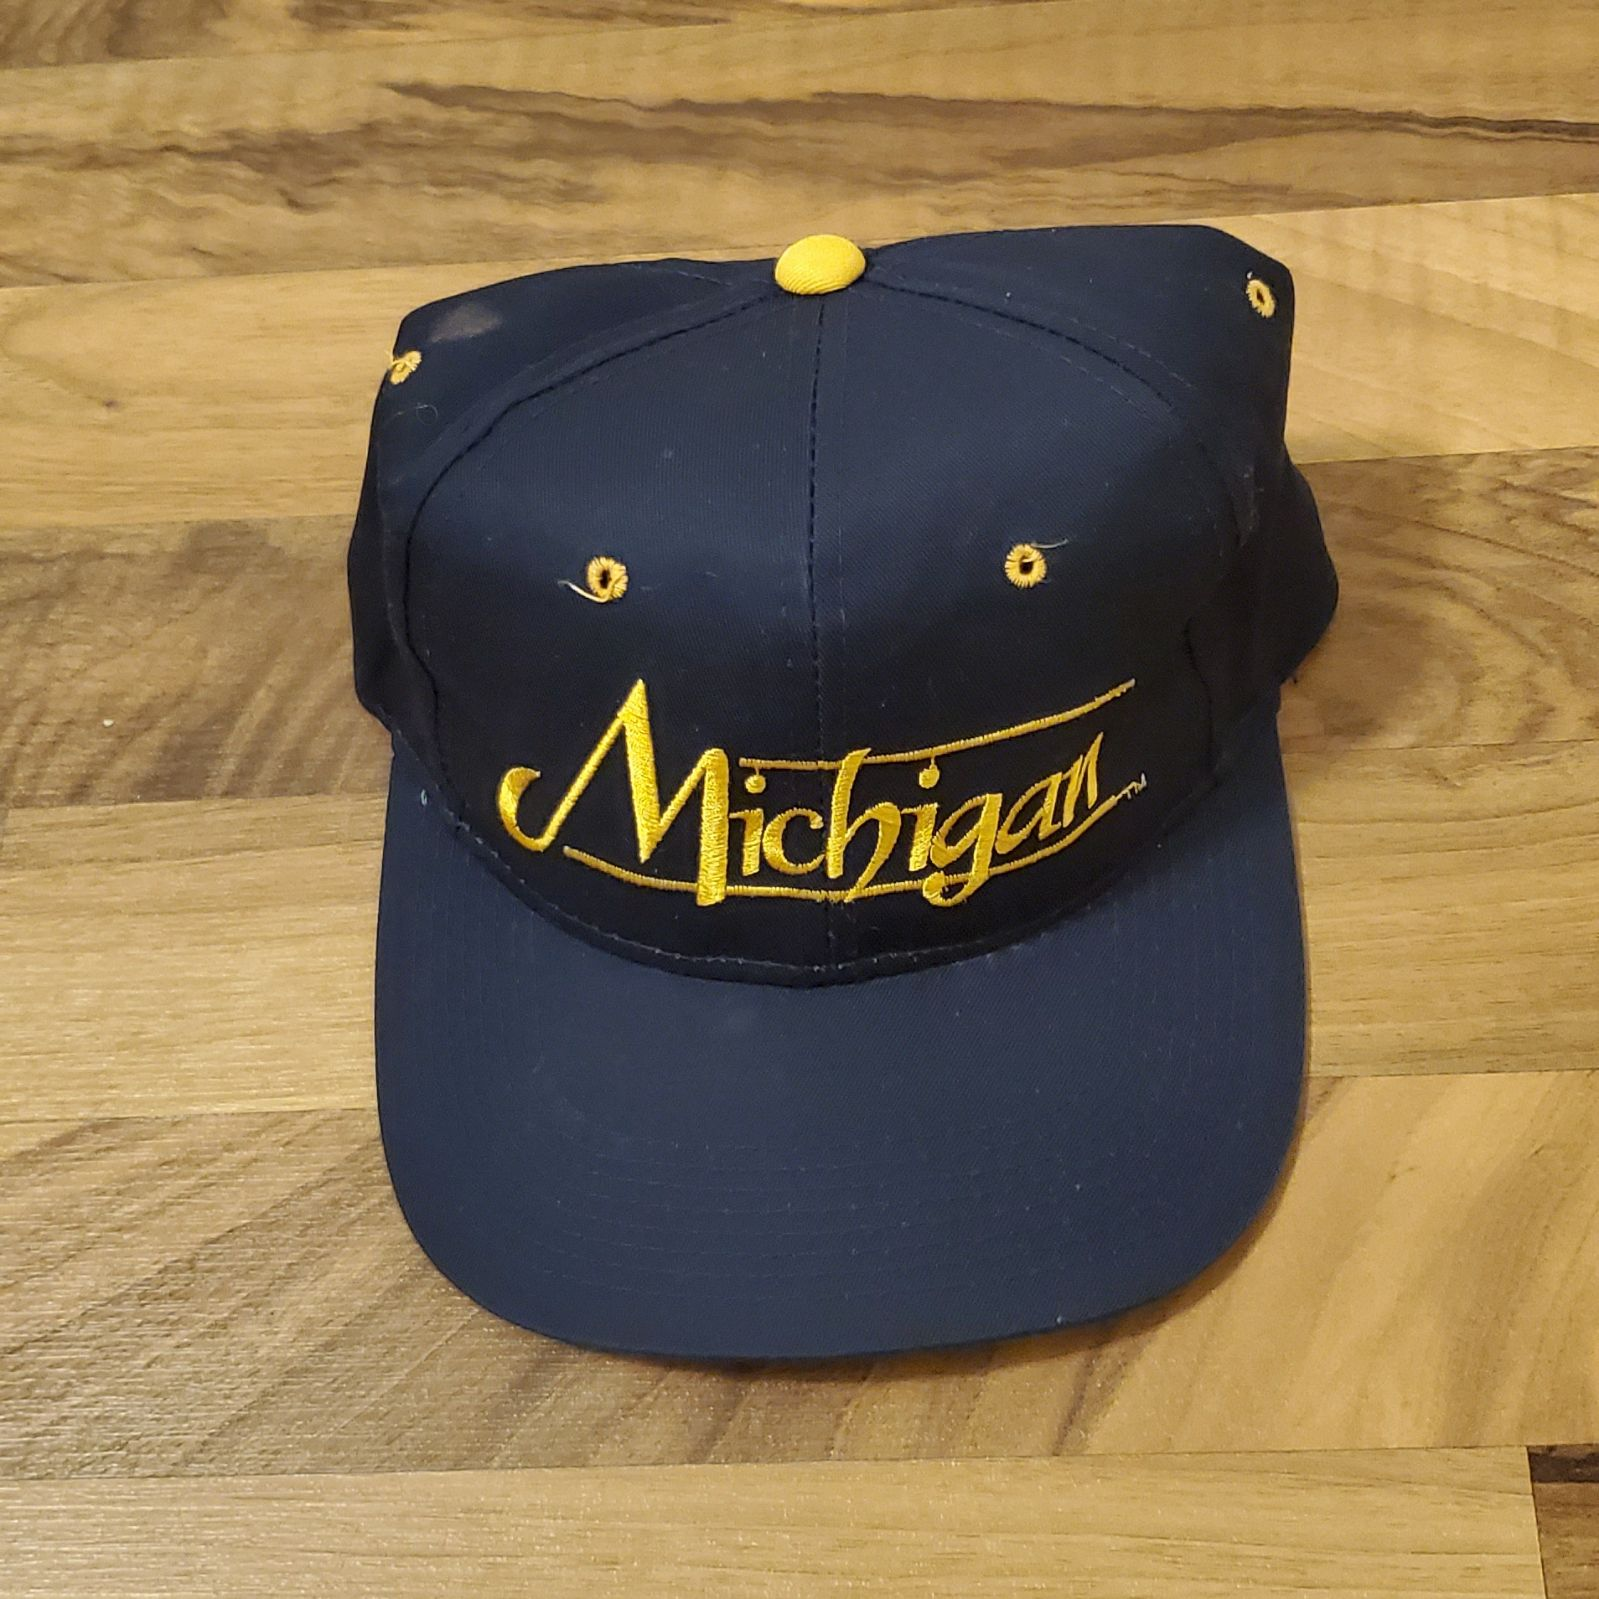 Vintage Michigan Snapback Hat